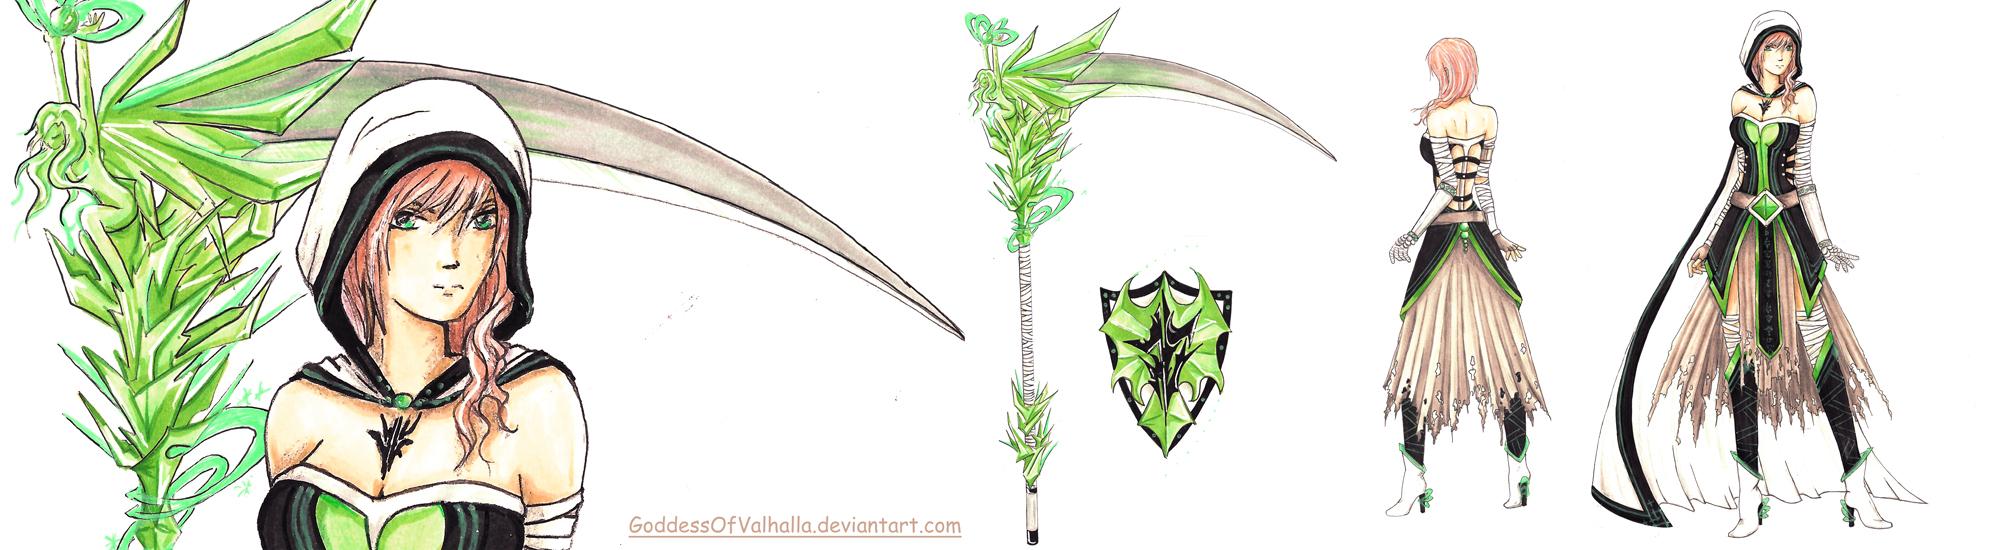 LIGHTNING FARRON - CONTEST - GODDESS OF DEATH by GoddessOfValhalla